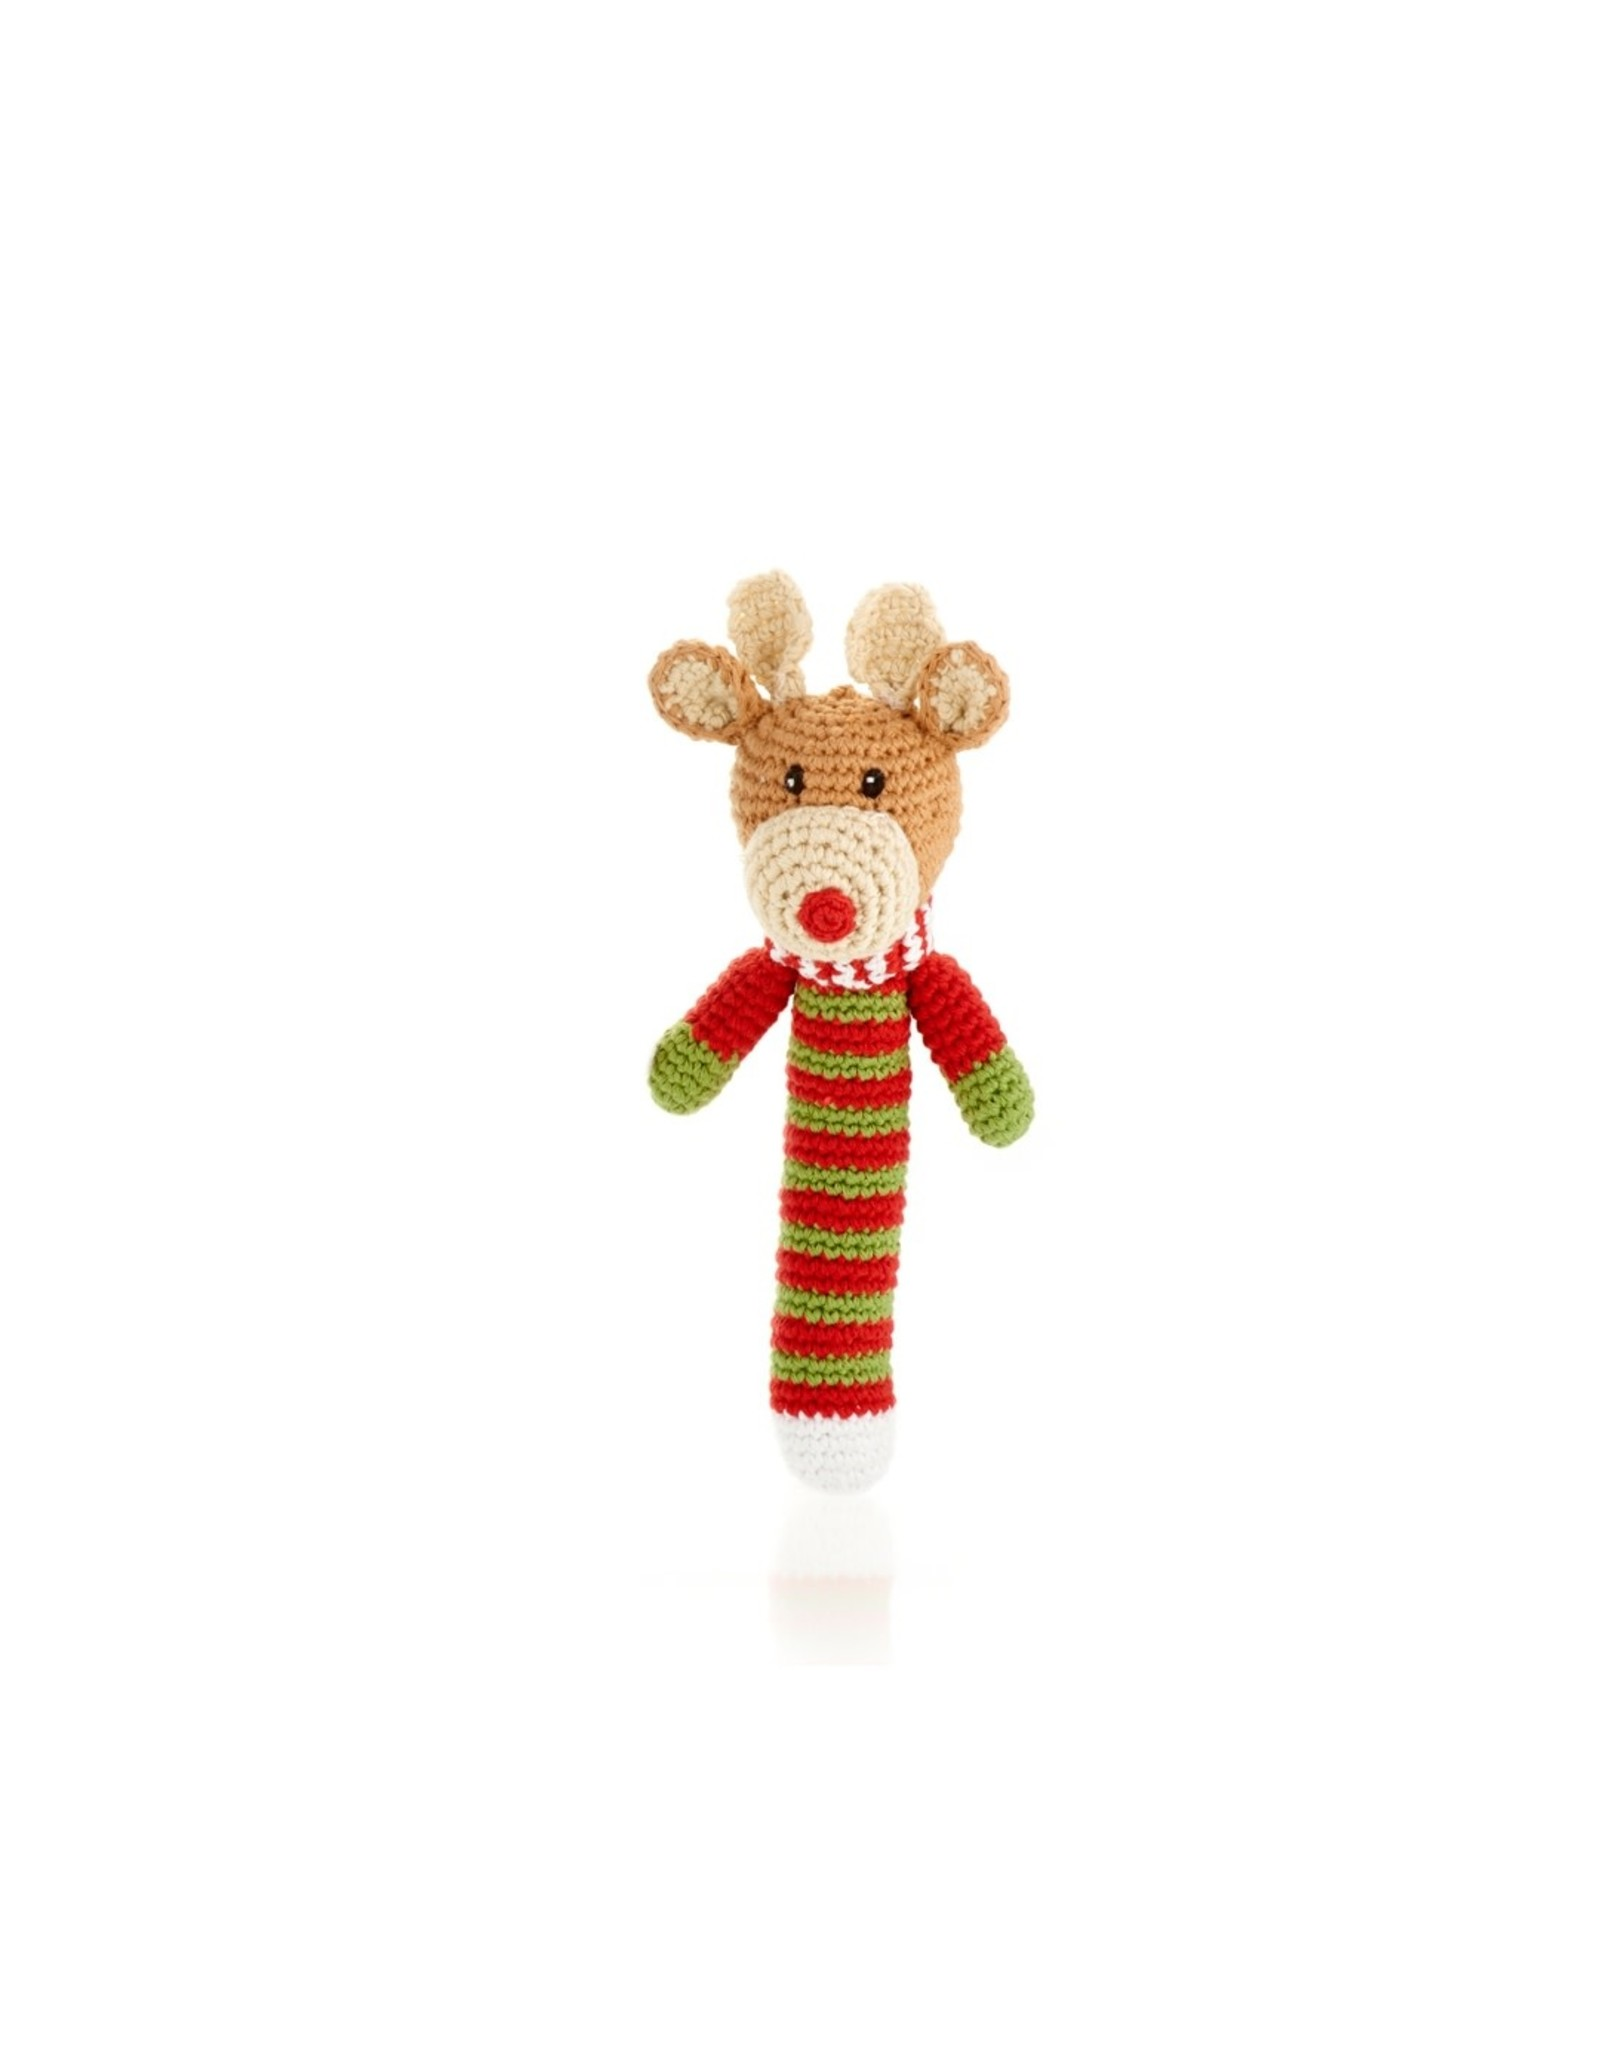 Pebble Holiday Stick Rattle, Assorted. Bangladesh